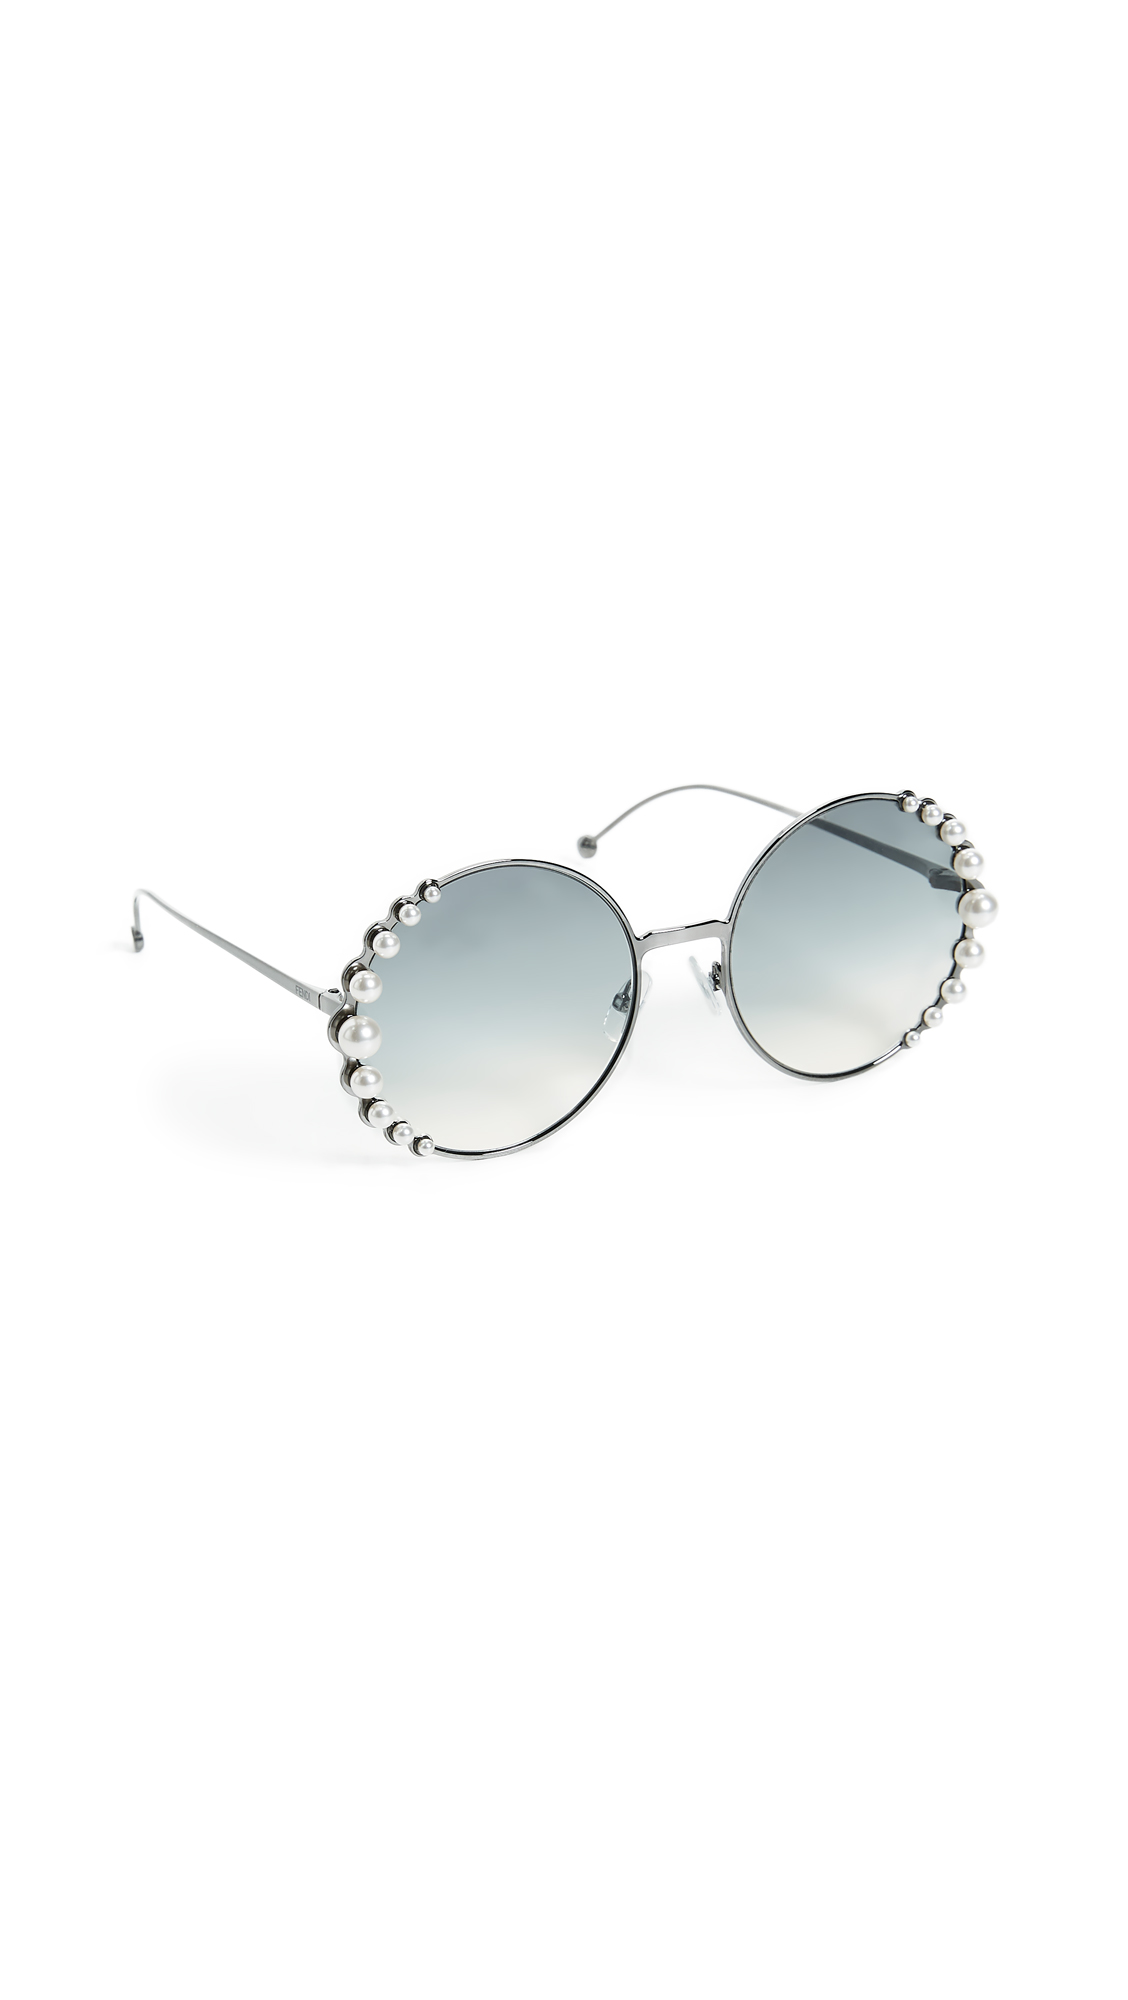 b1af55efaad6 Fendi Round Pearl Frame Sunglasses